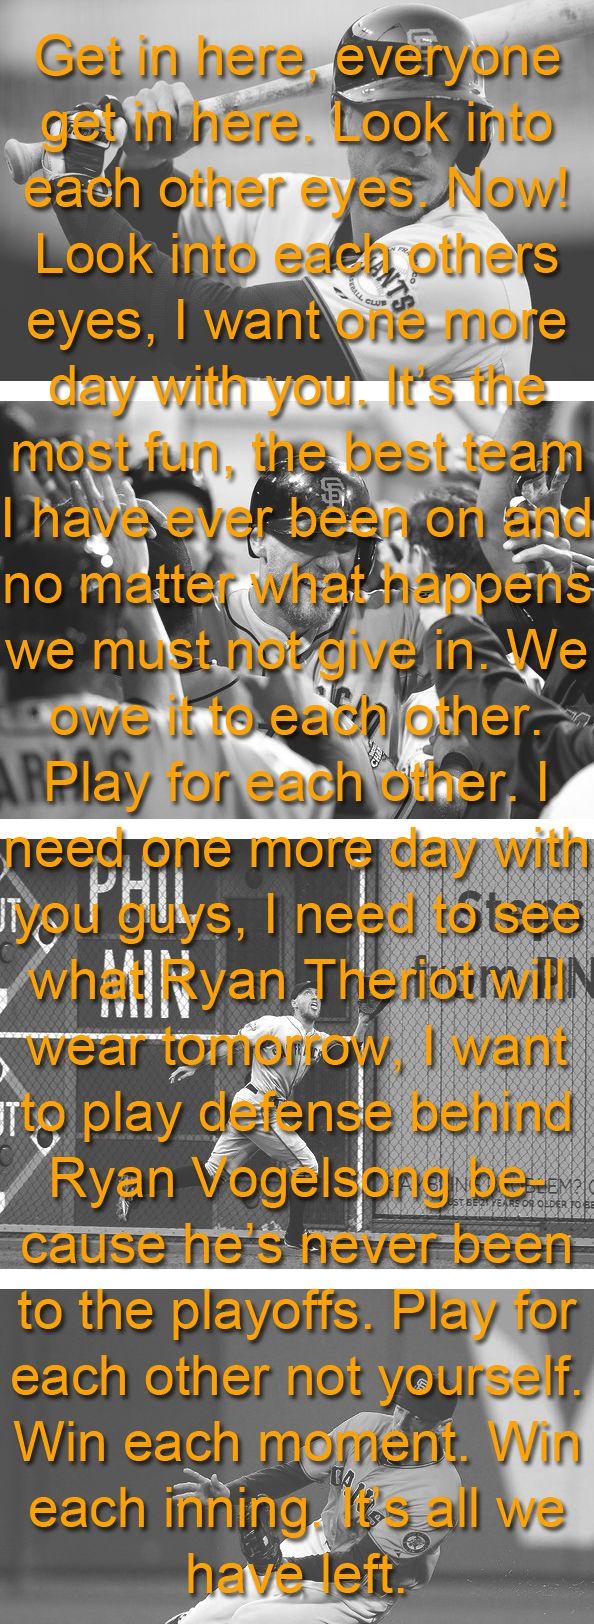 Inspiration - HUNTER PENCE'S motivation speech...amazing...